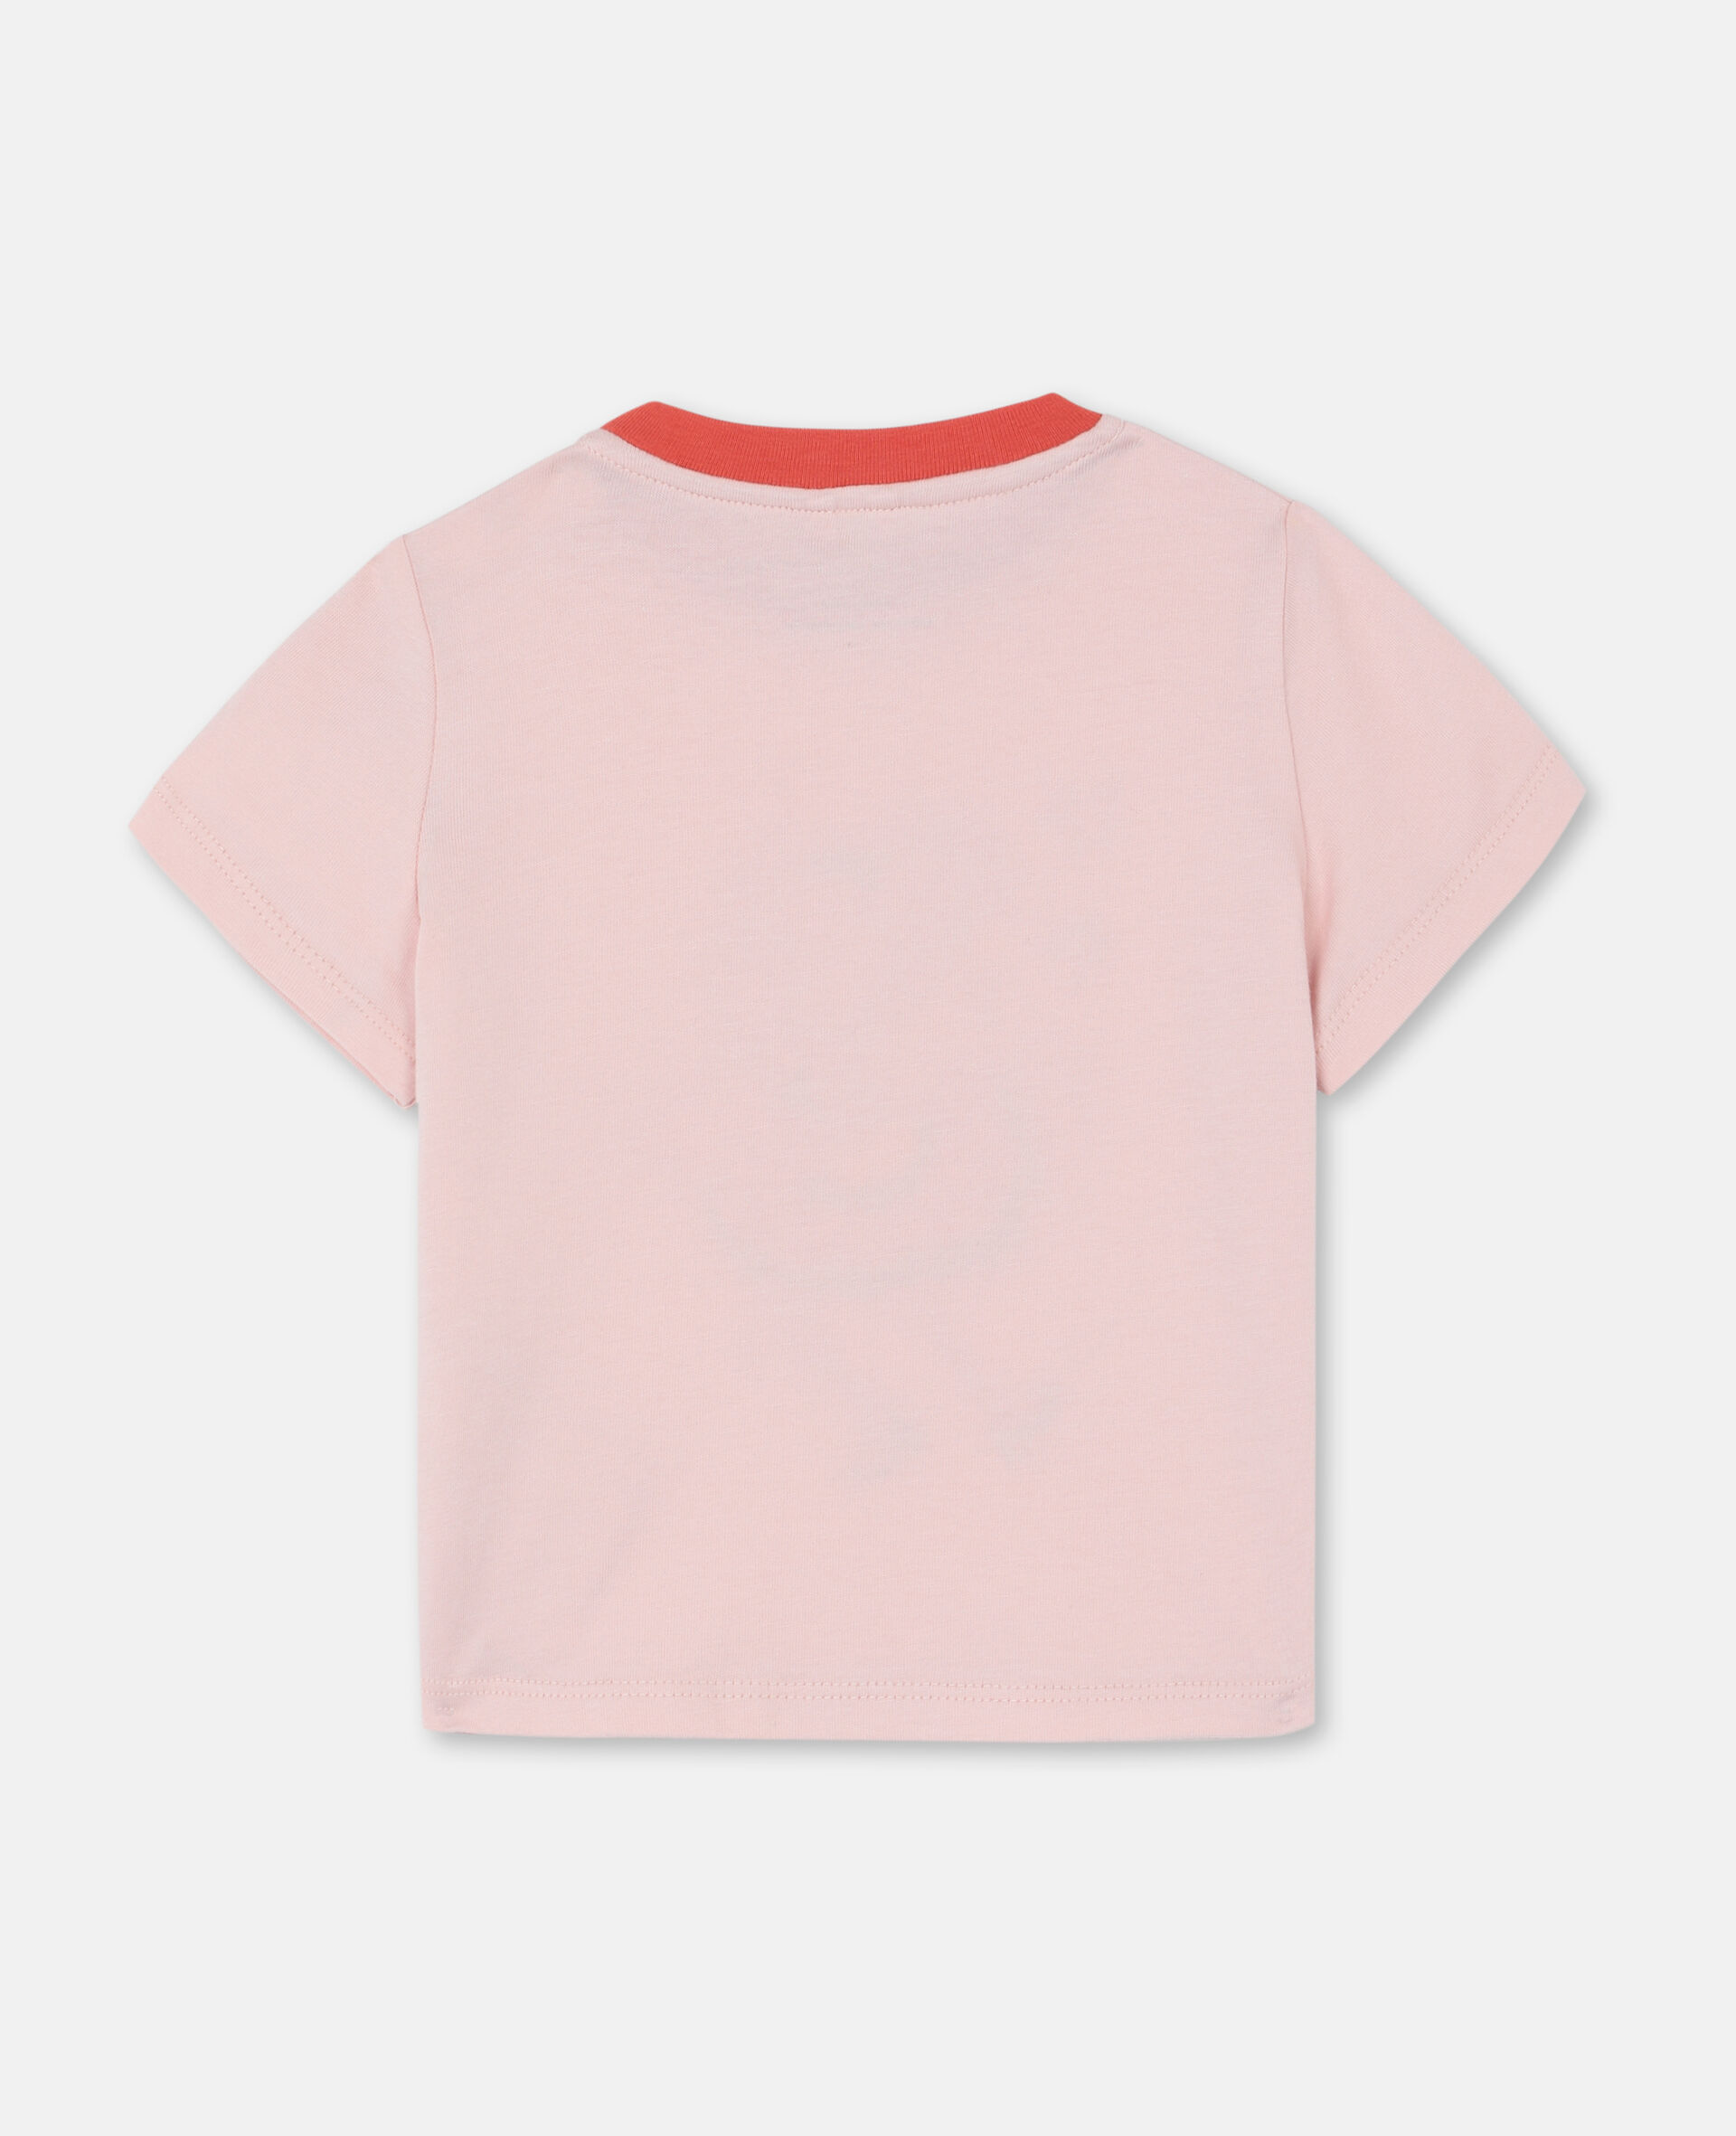 Dancing Flamingo 棉质 T 恤-粉色-large image number 3